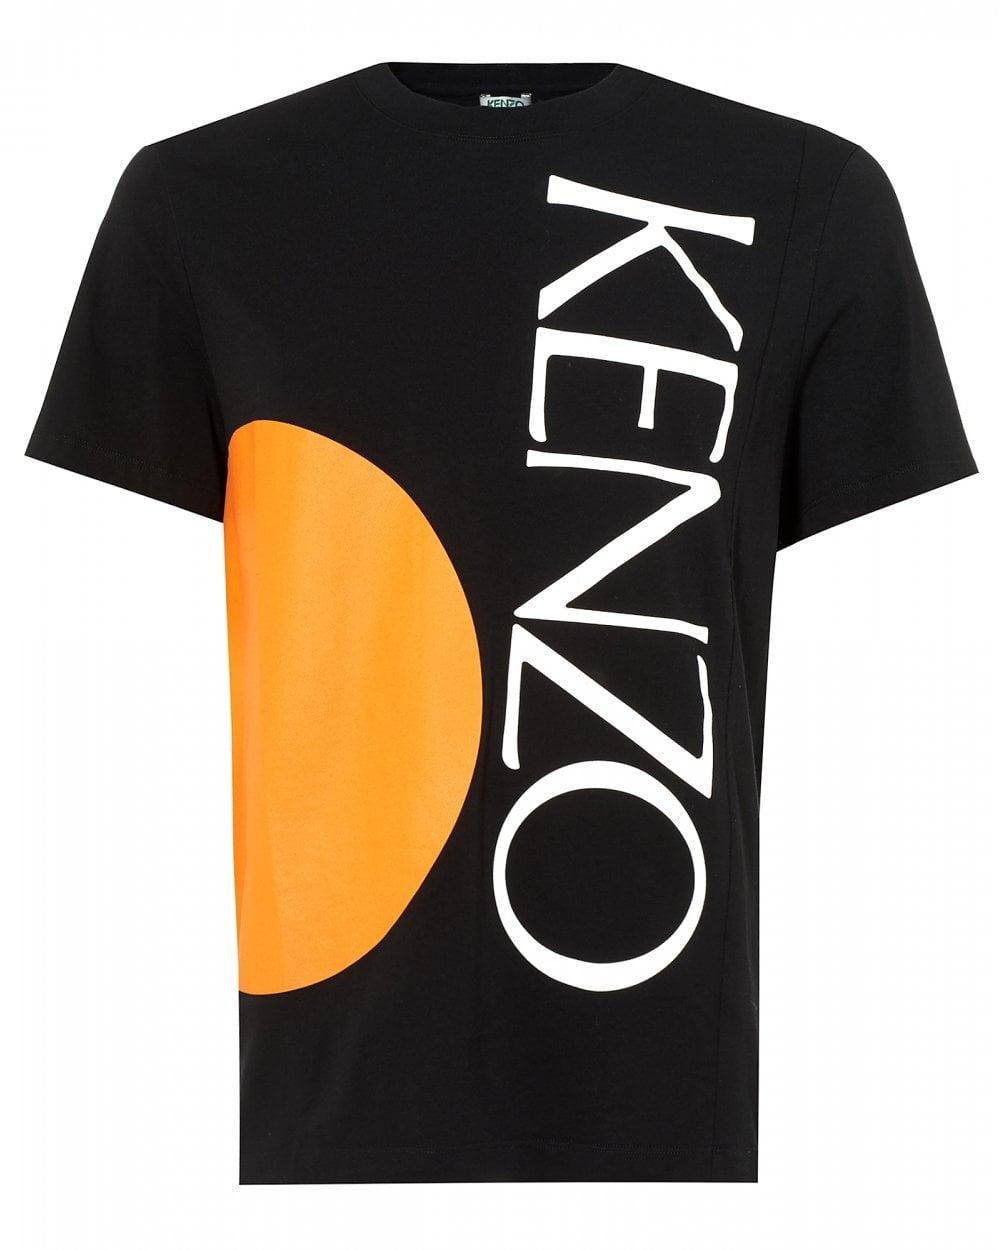 07baa9ba8 KENZO - Black Logo Print T-shirt for Men - Lyst. View fullscreen